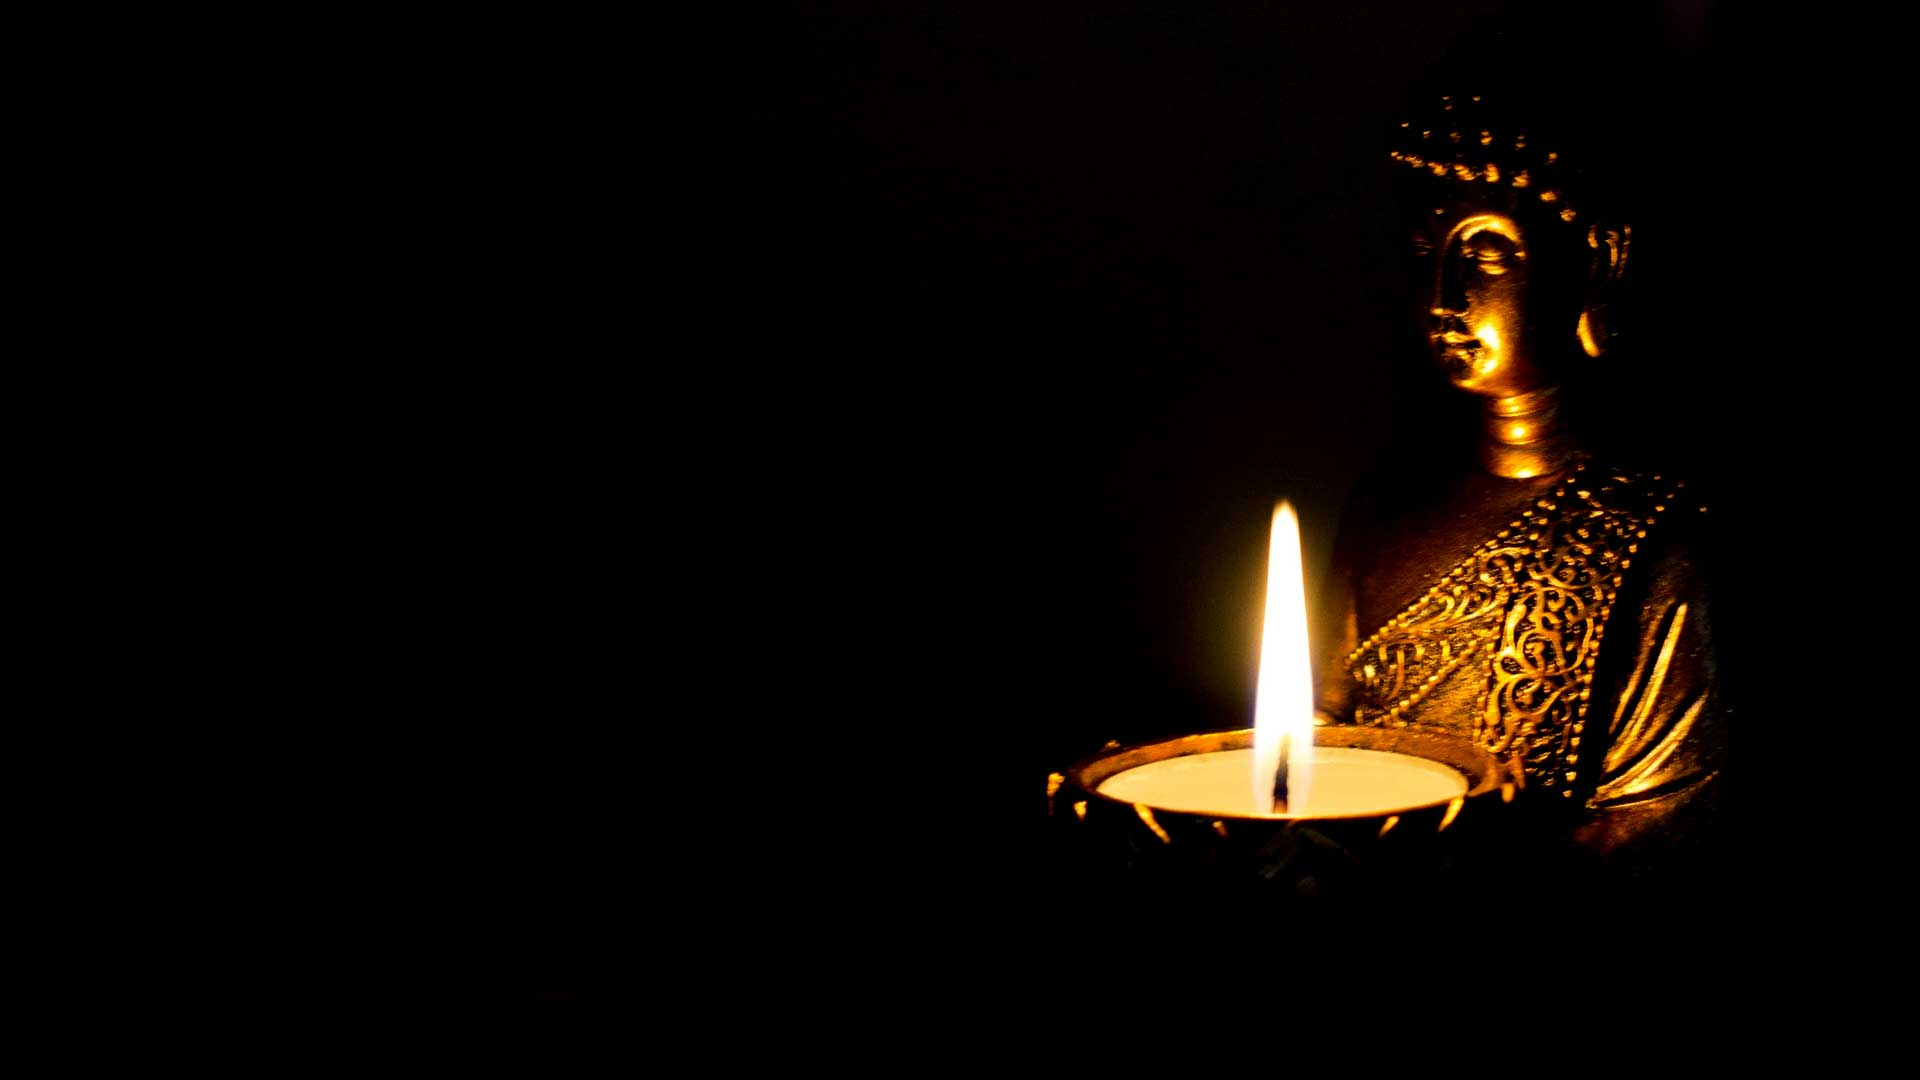 budha in the dark